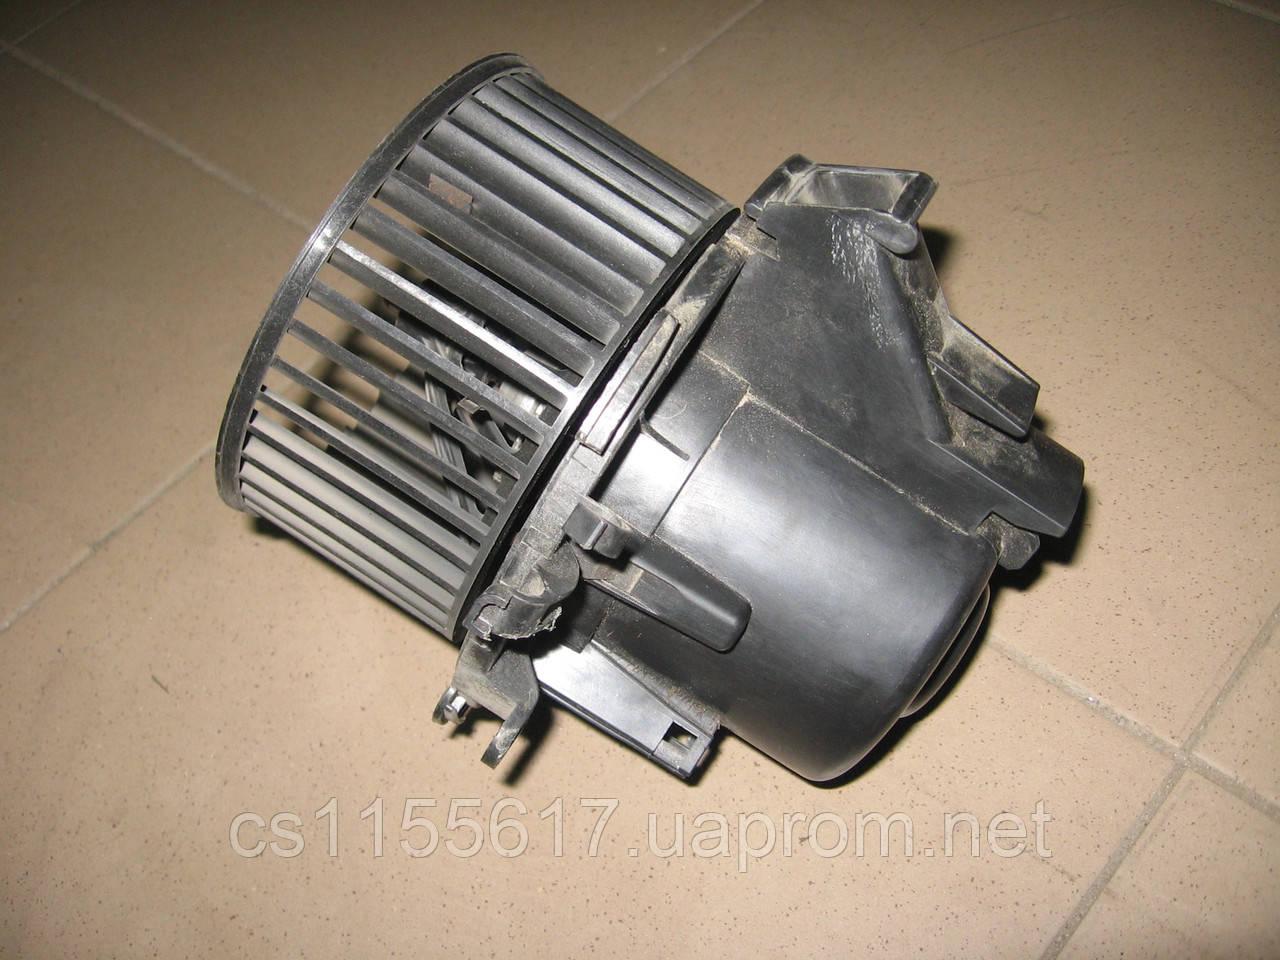 Моторчик печки 7701057555 с кондиционером б/у Renault Master, Opel Movano, Nissan Interstar год 2003-10